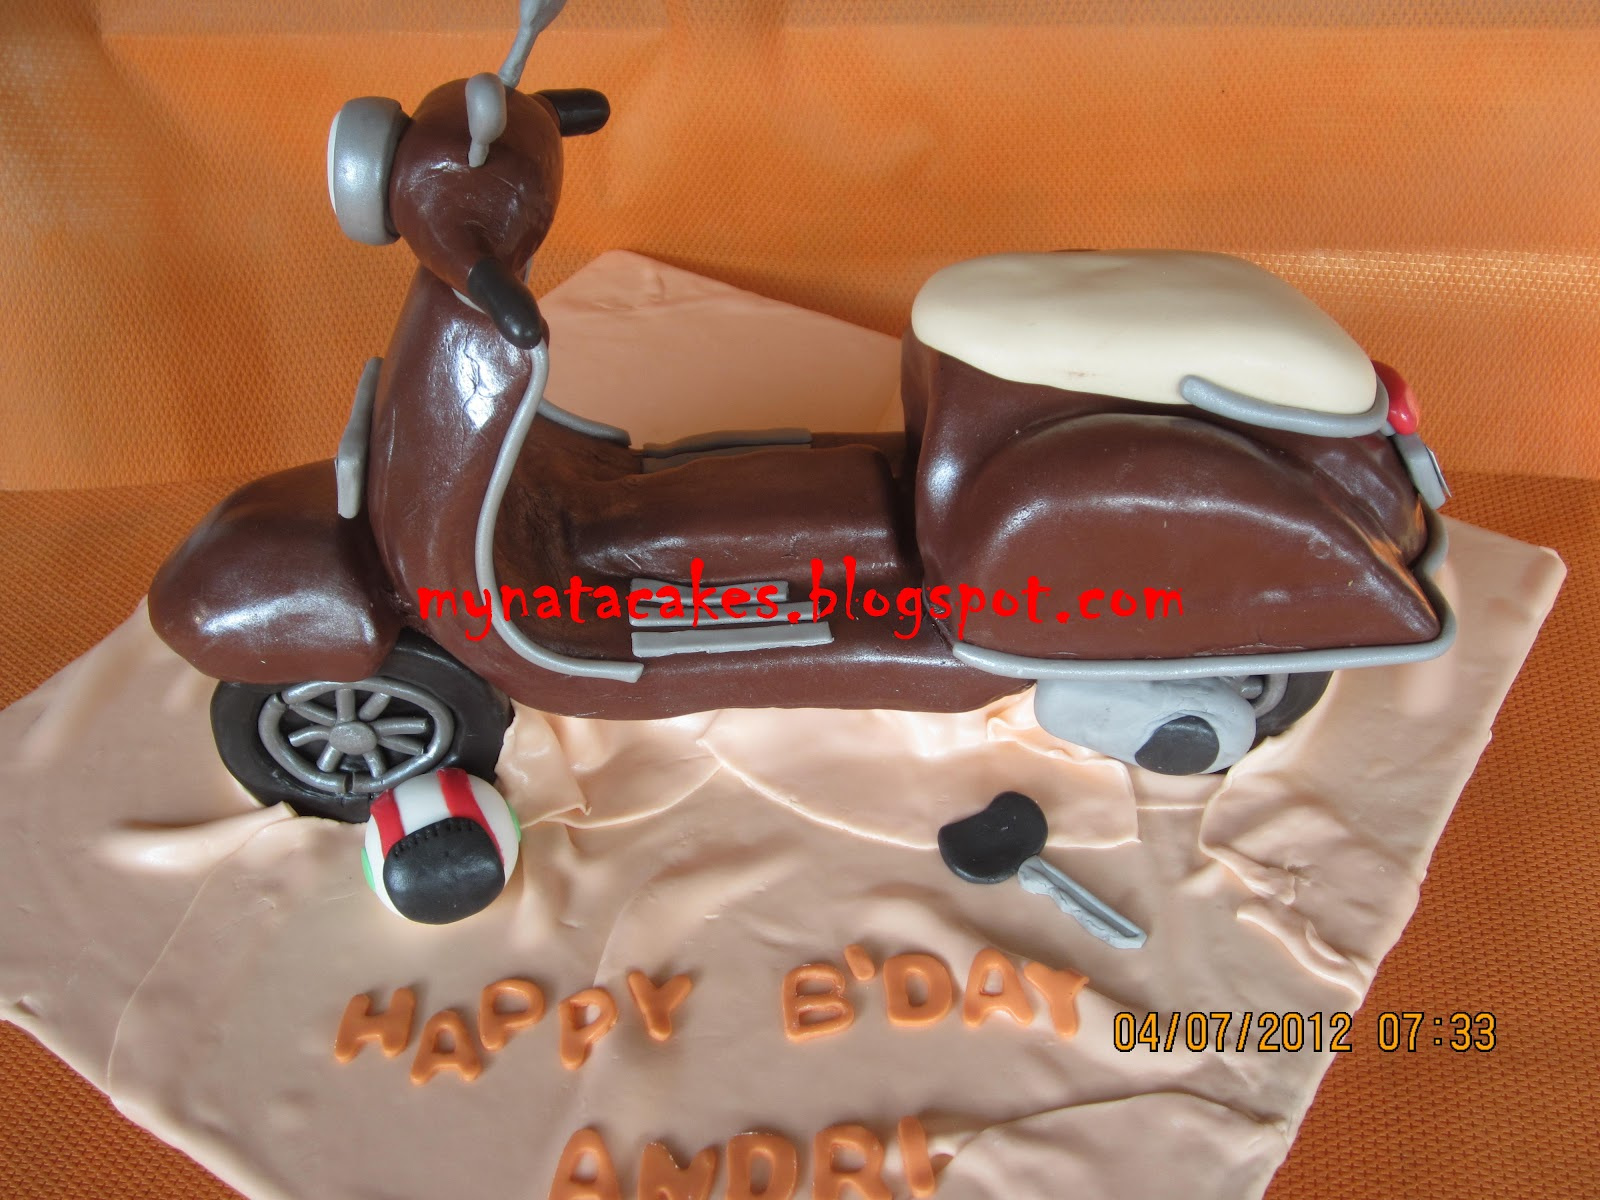 Mynata Cakes: Vespa birthday cake for Andry